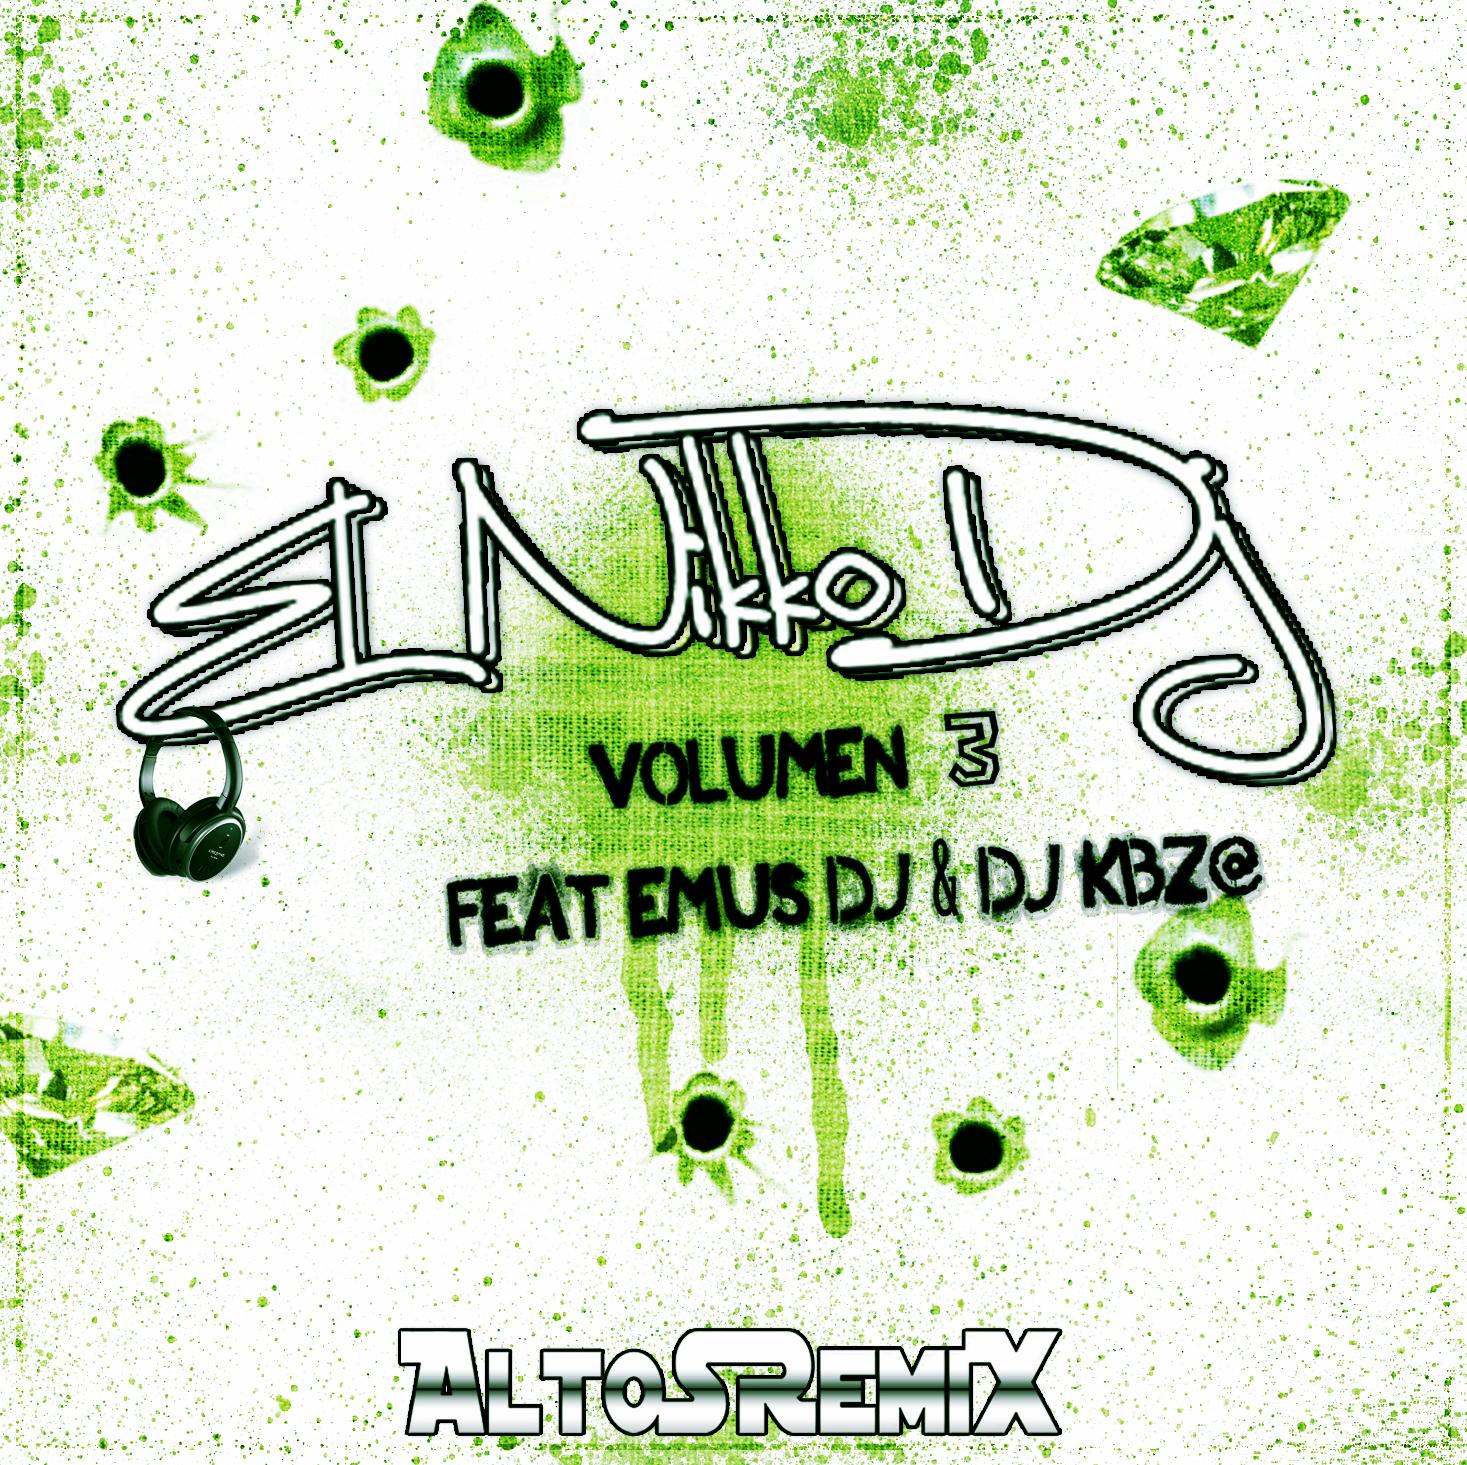 El Nikko Dj - Volumen 3 Ft. Emus Dj & Dj KBZ@ (2015)